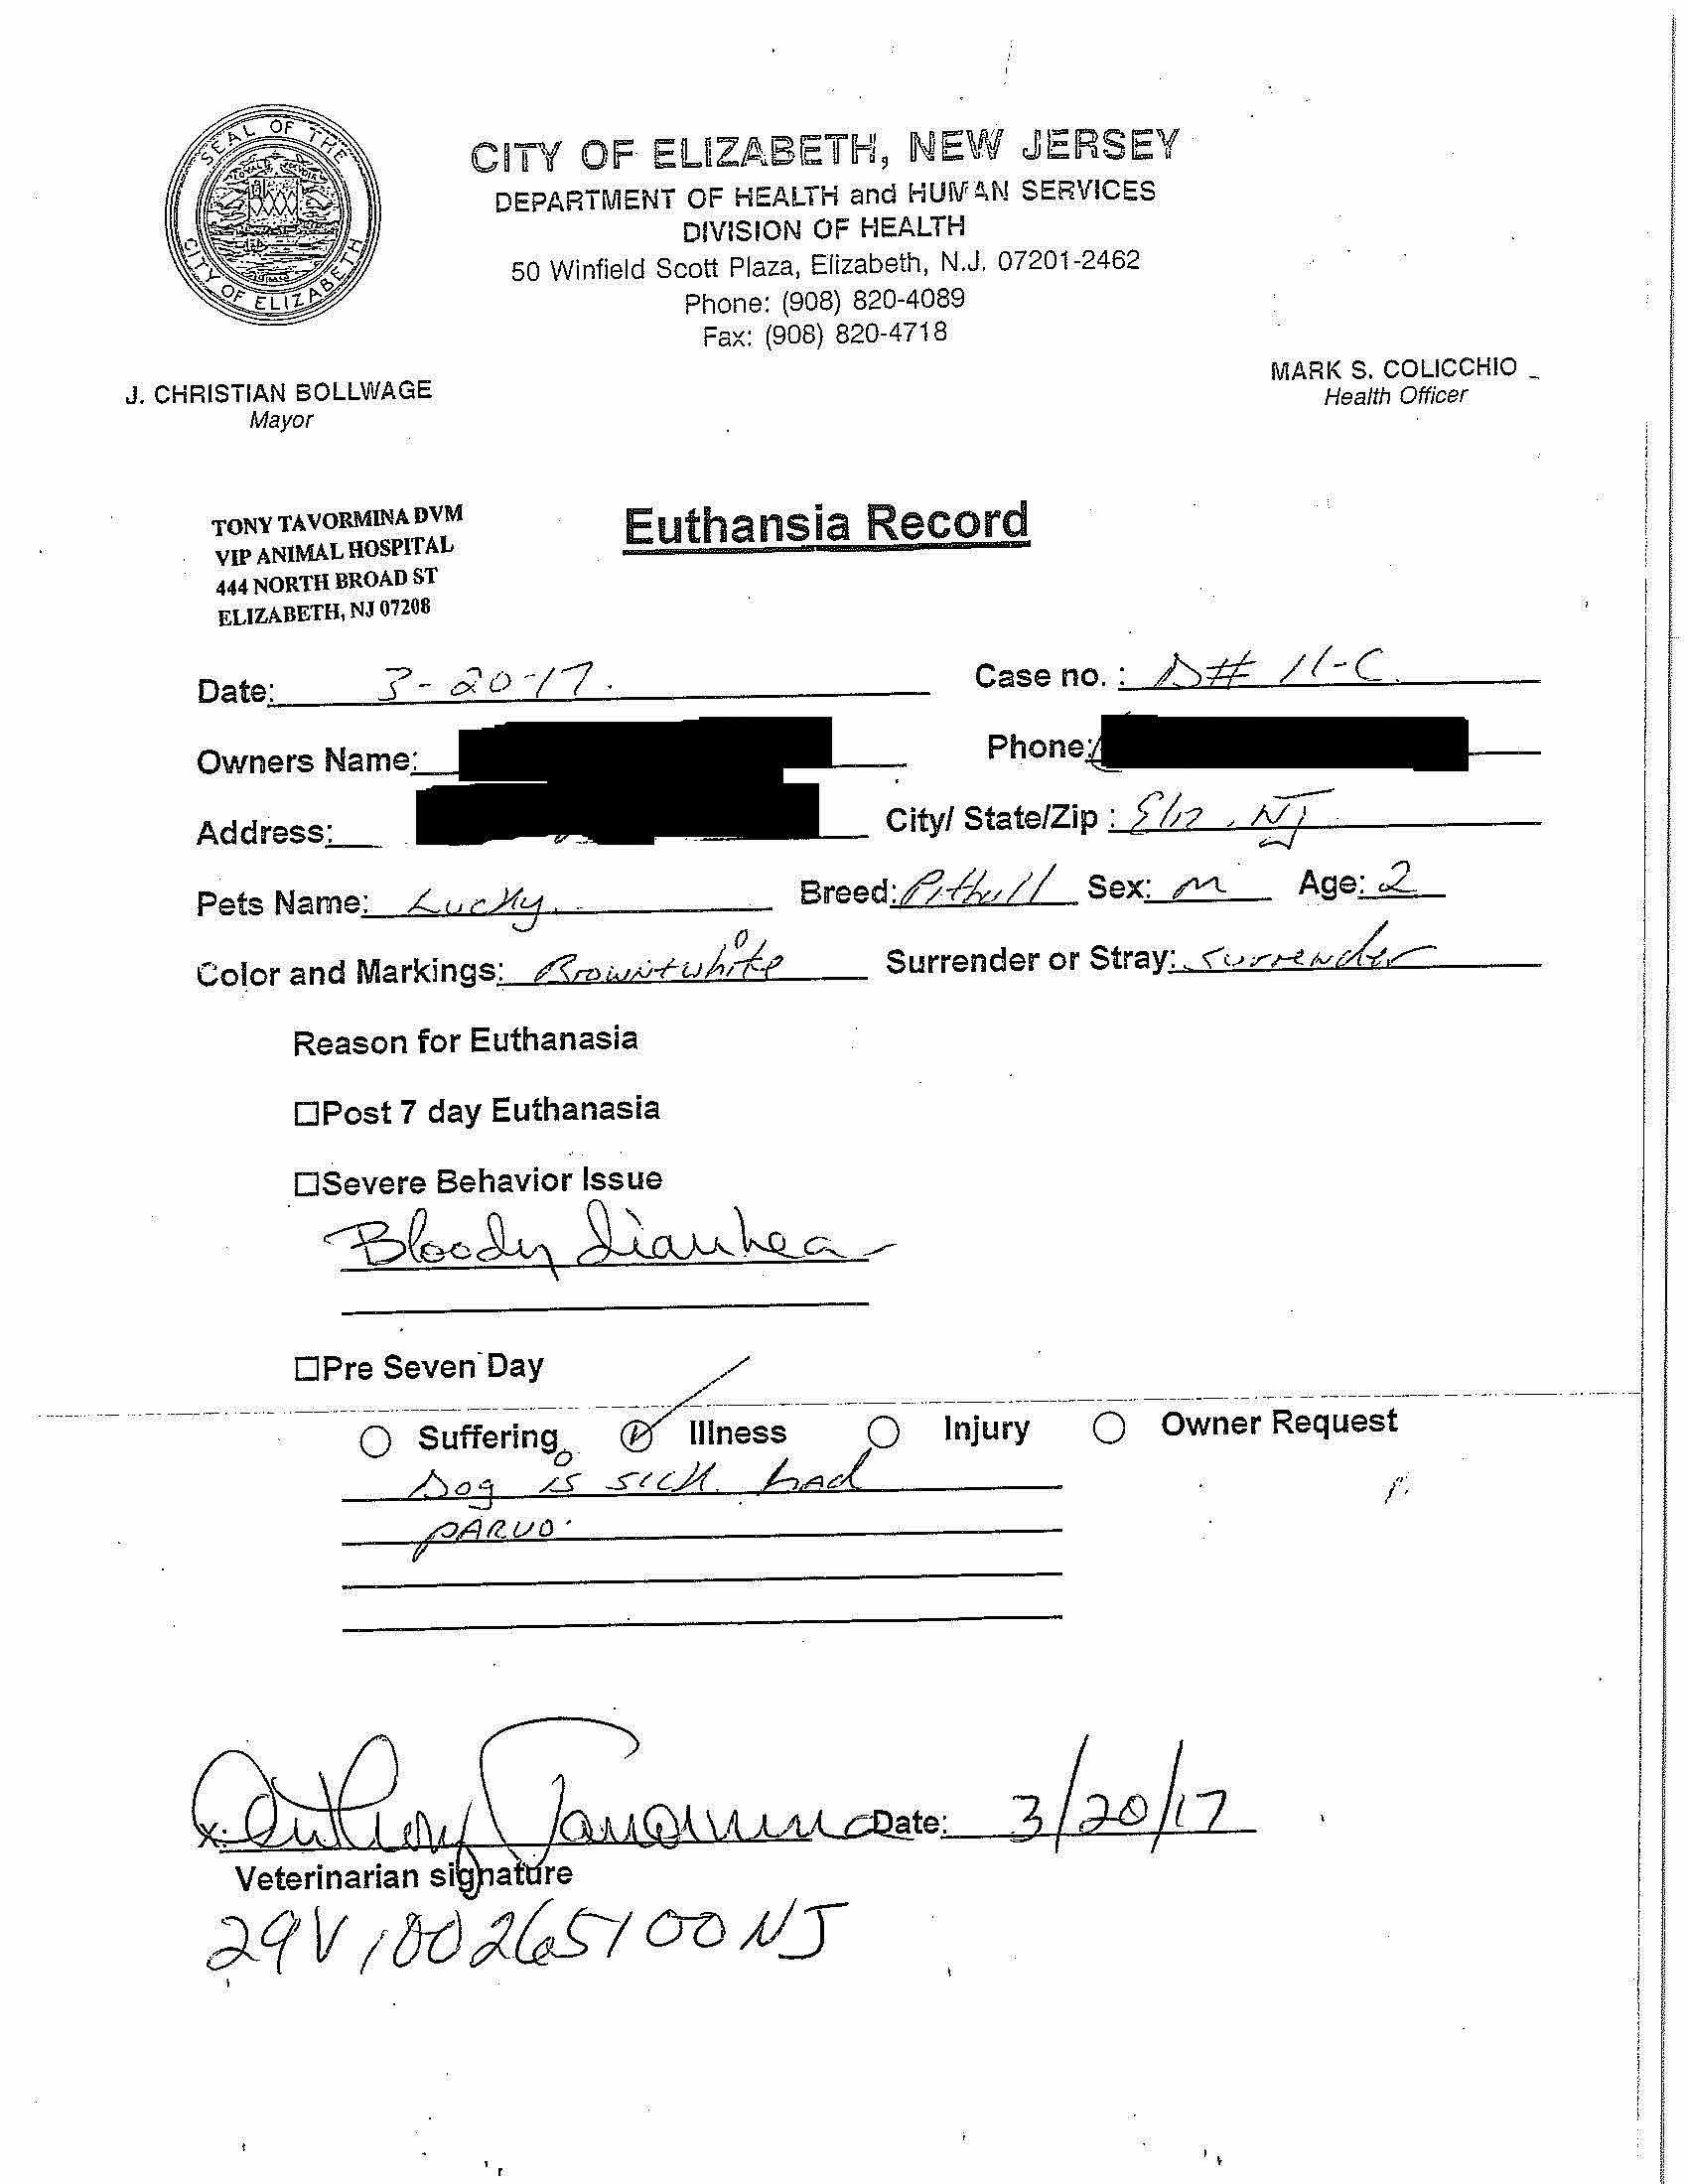 Dog ID 11-C Euthanasia Record.jpg